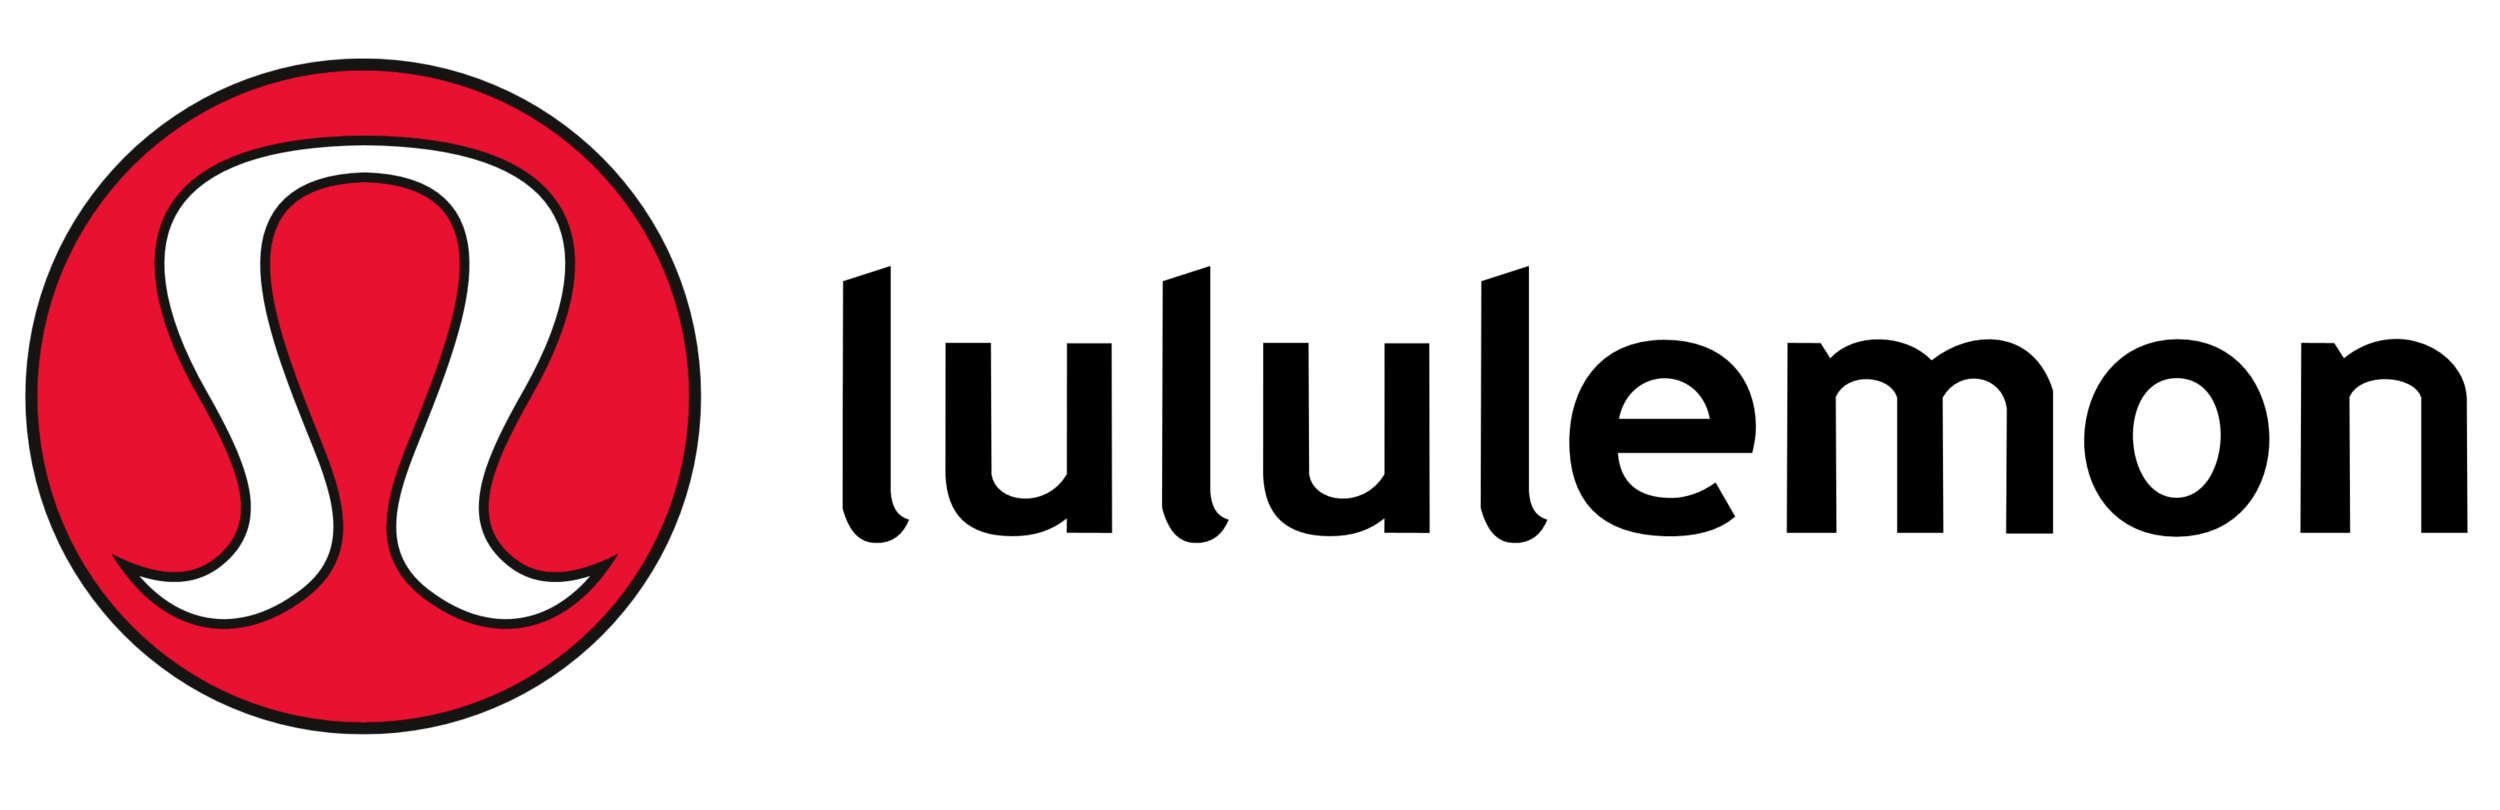 Lululemon_logo-1.png